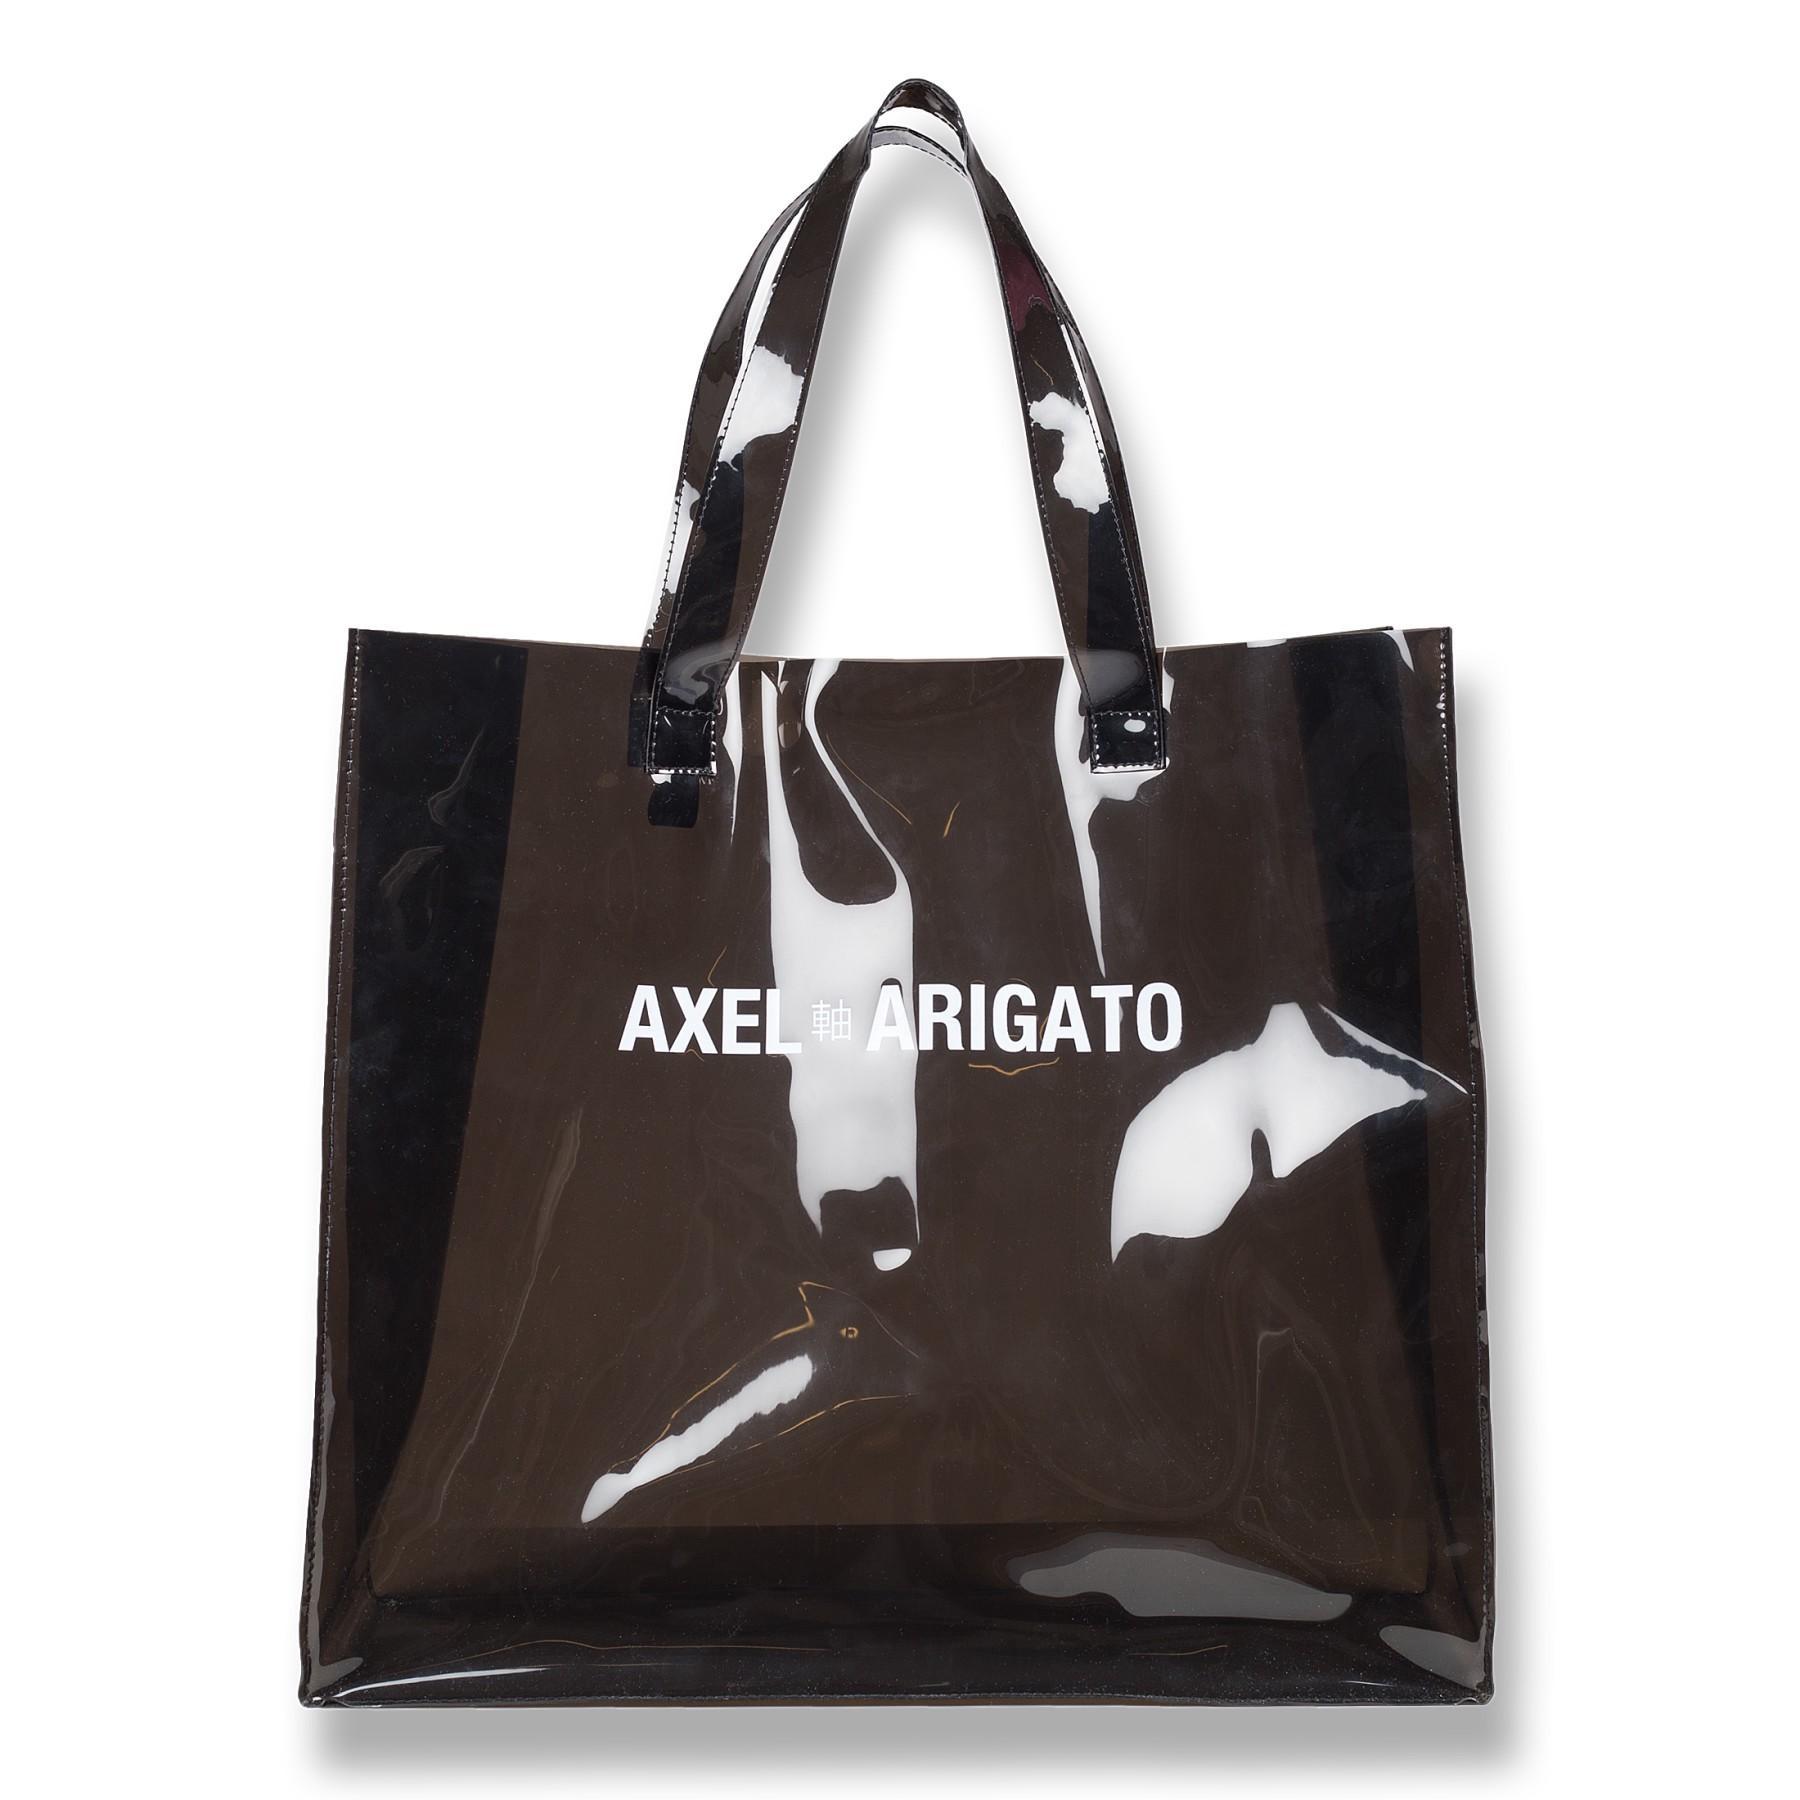 bafc206e97 Axel Arigato Clear Grocery Tote Bag - Clear Black Vinyl